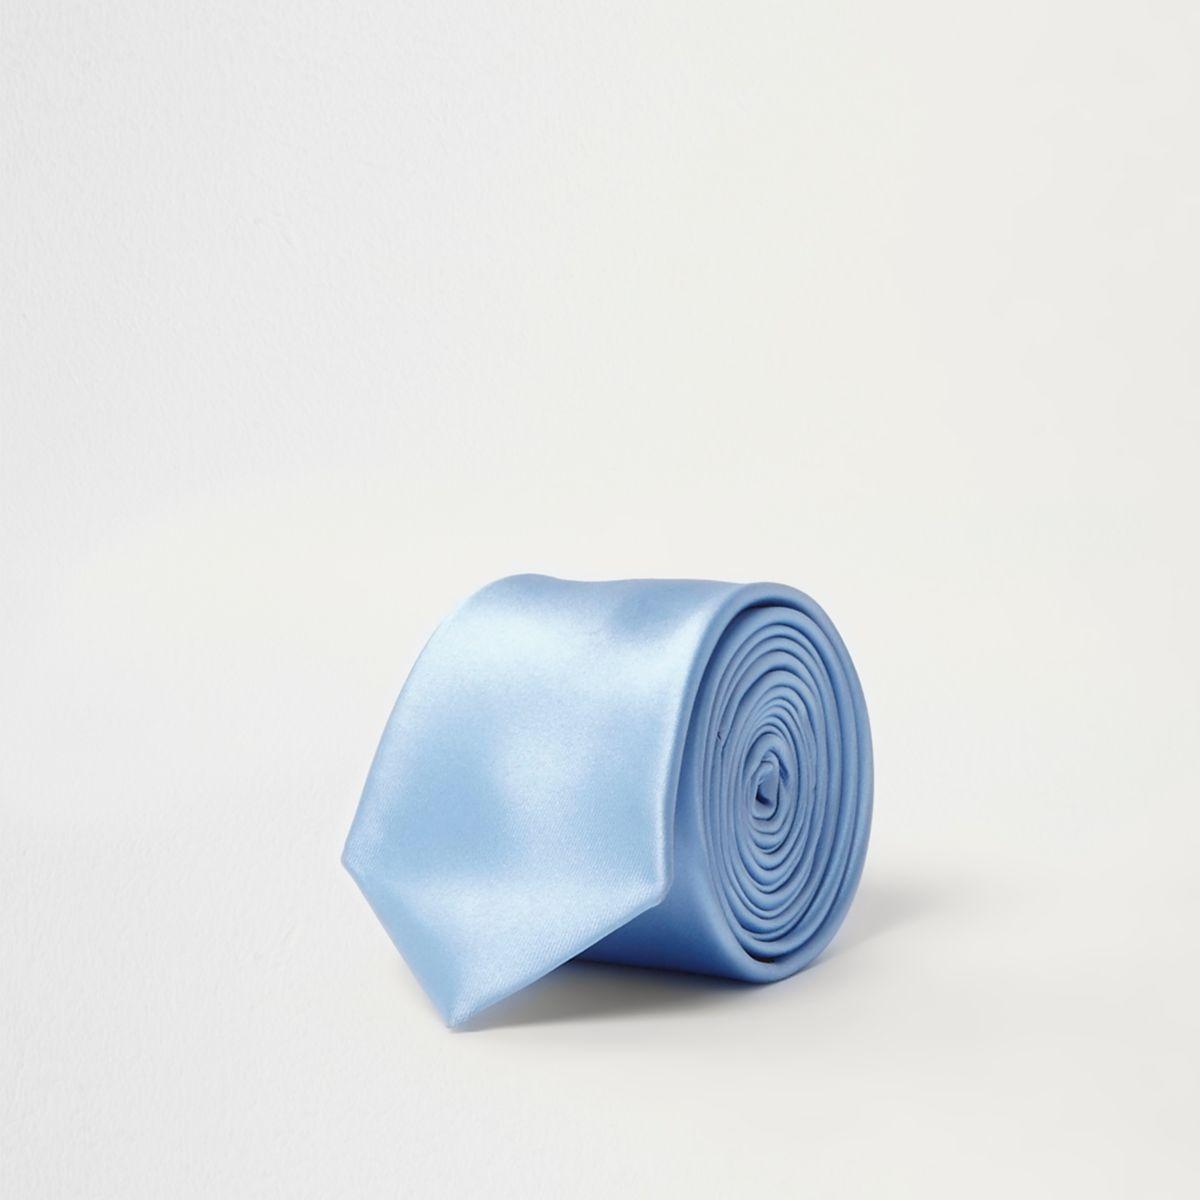 Light blue satin pin tie